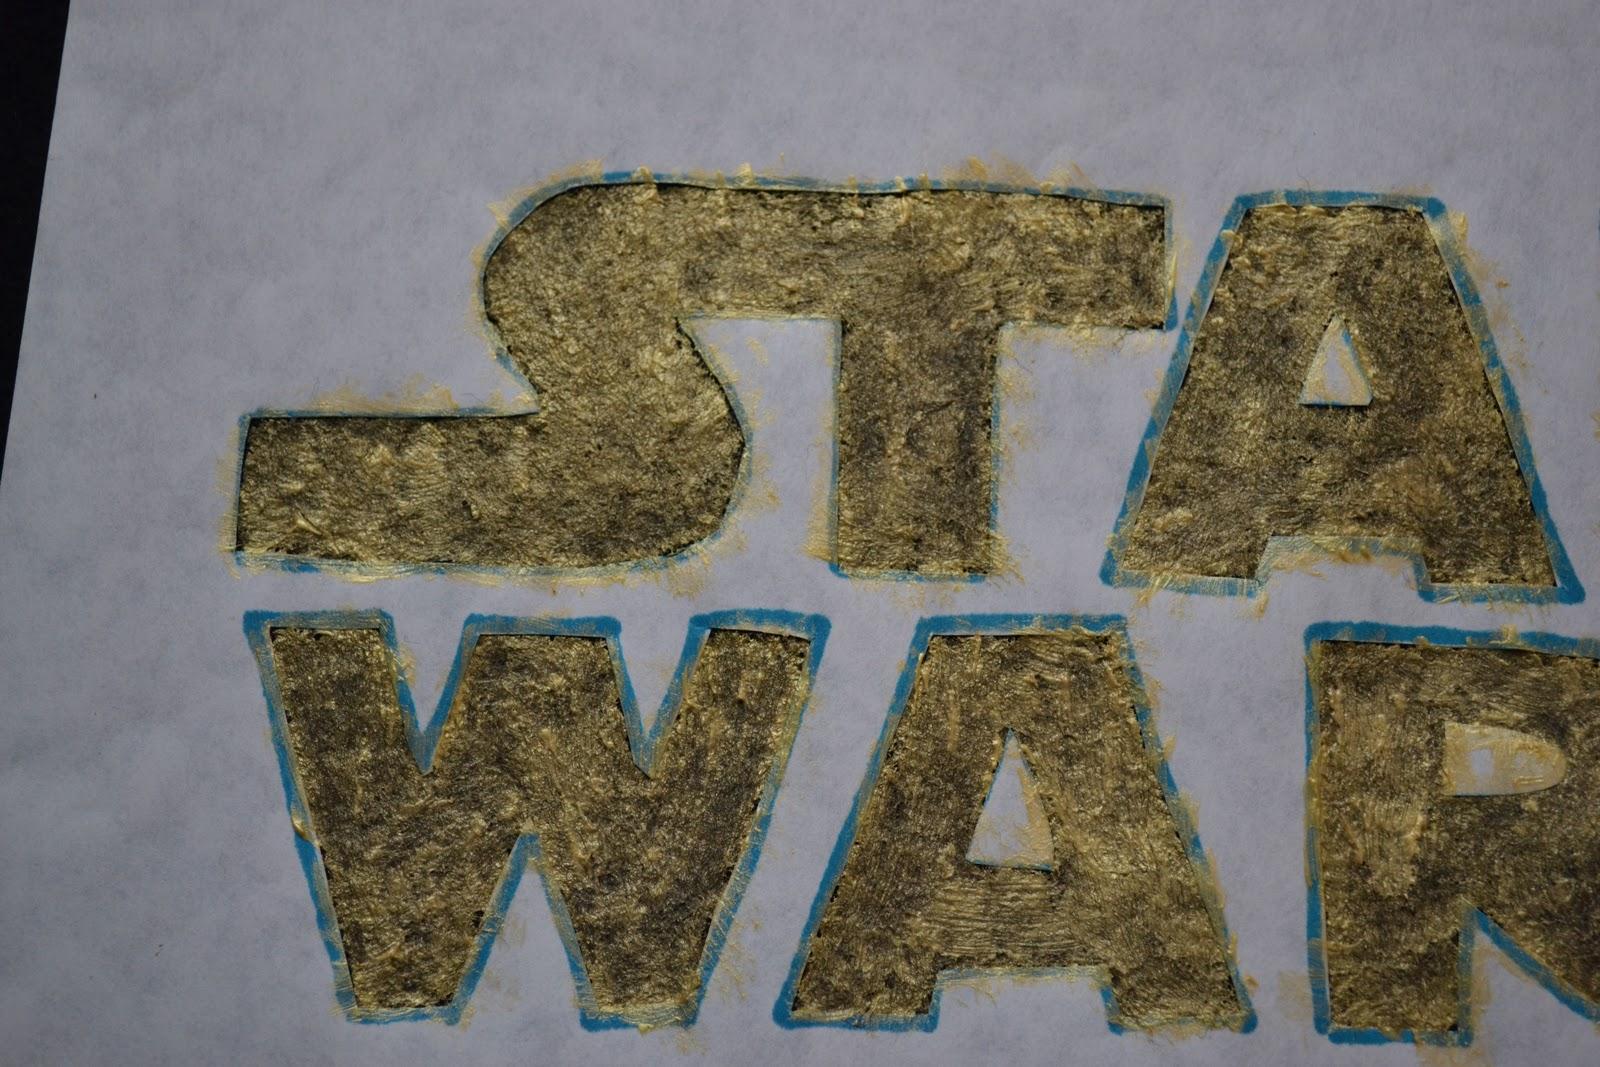 come together kids star wars fleece pillow